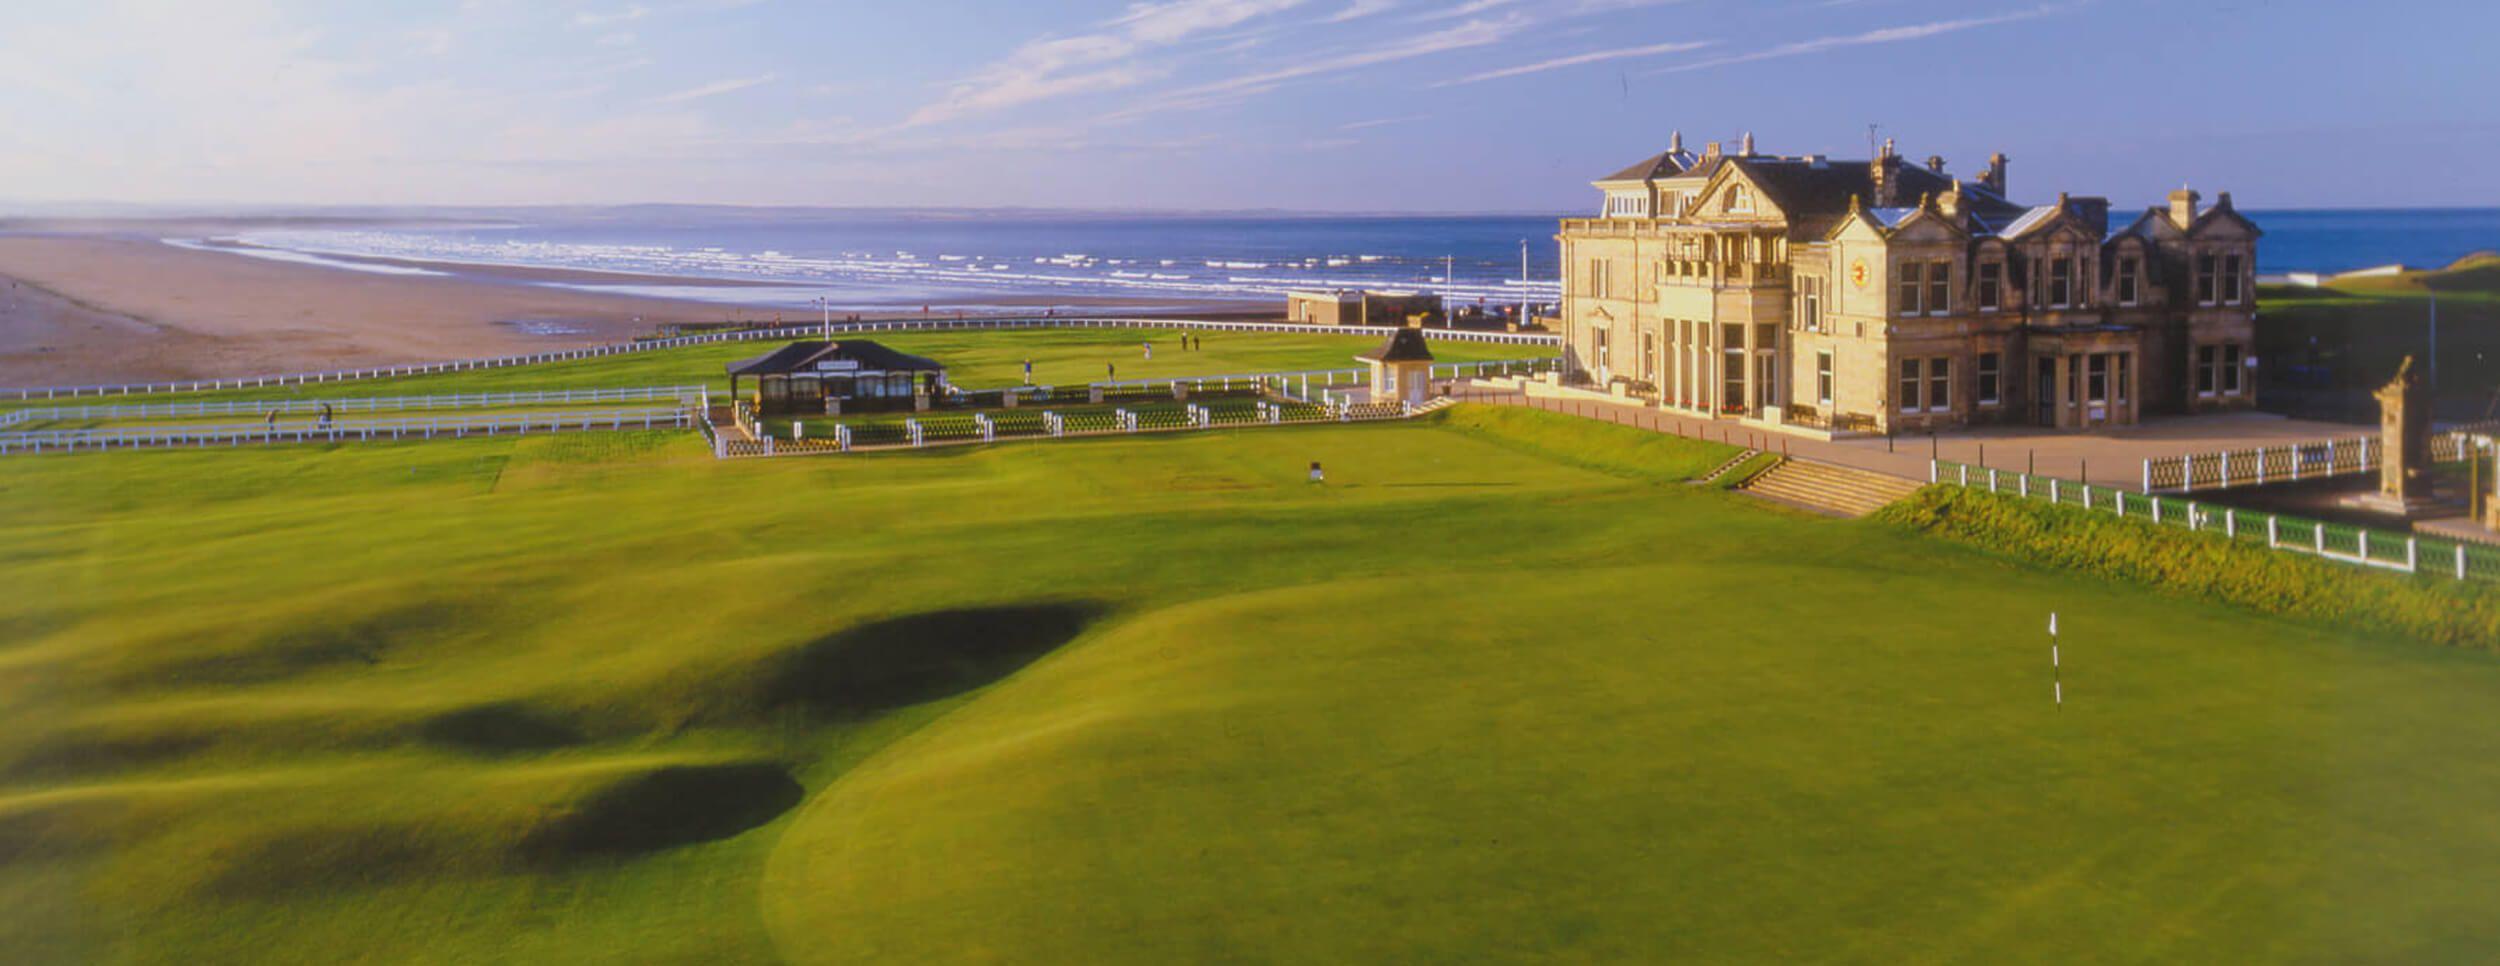 golf-expedition-golfreizen-schotland-heerlijk-golfen-mooiste-golfbanen